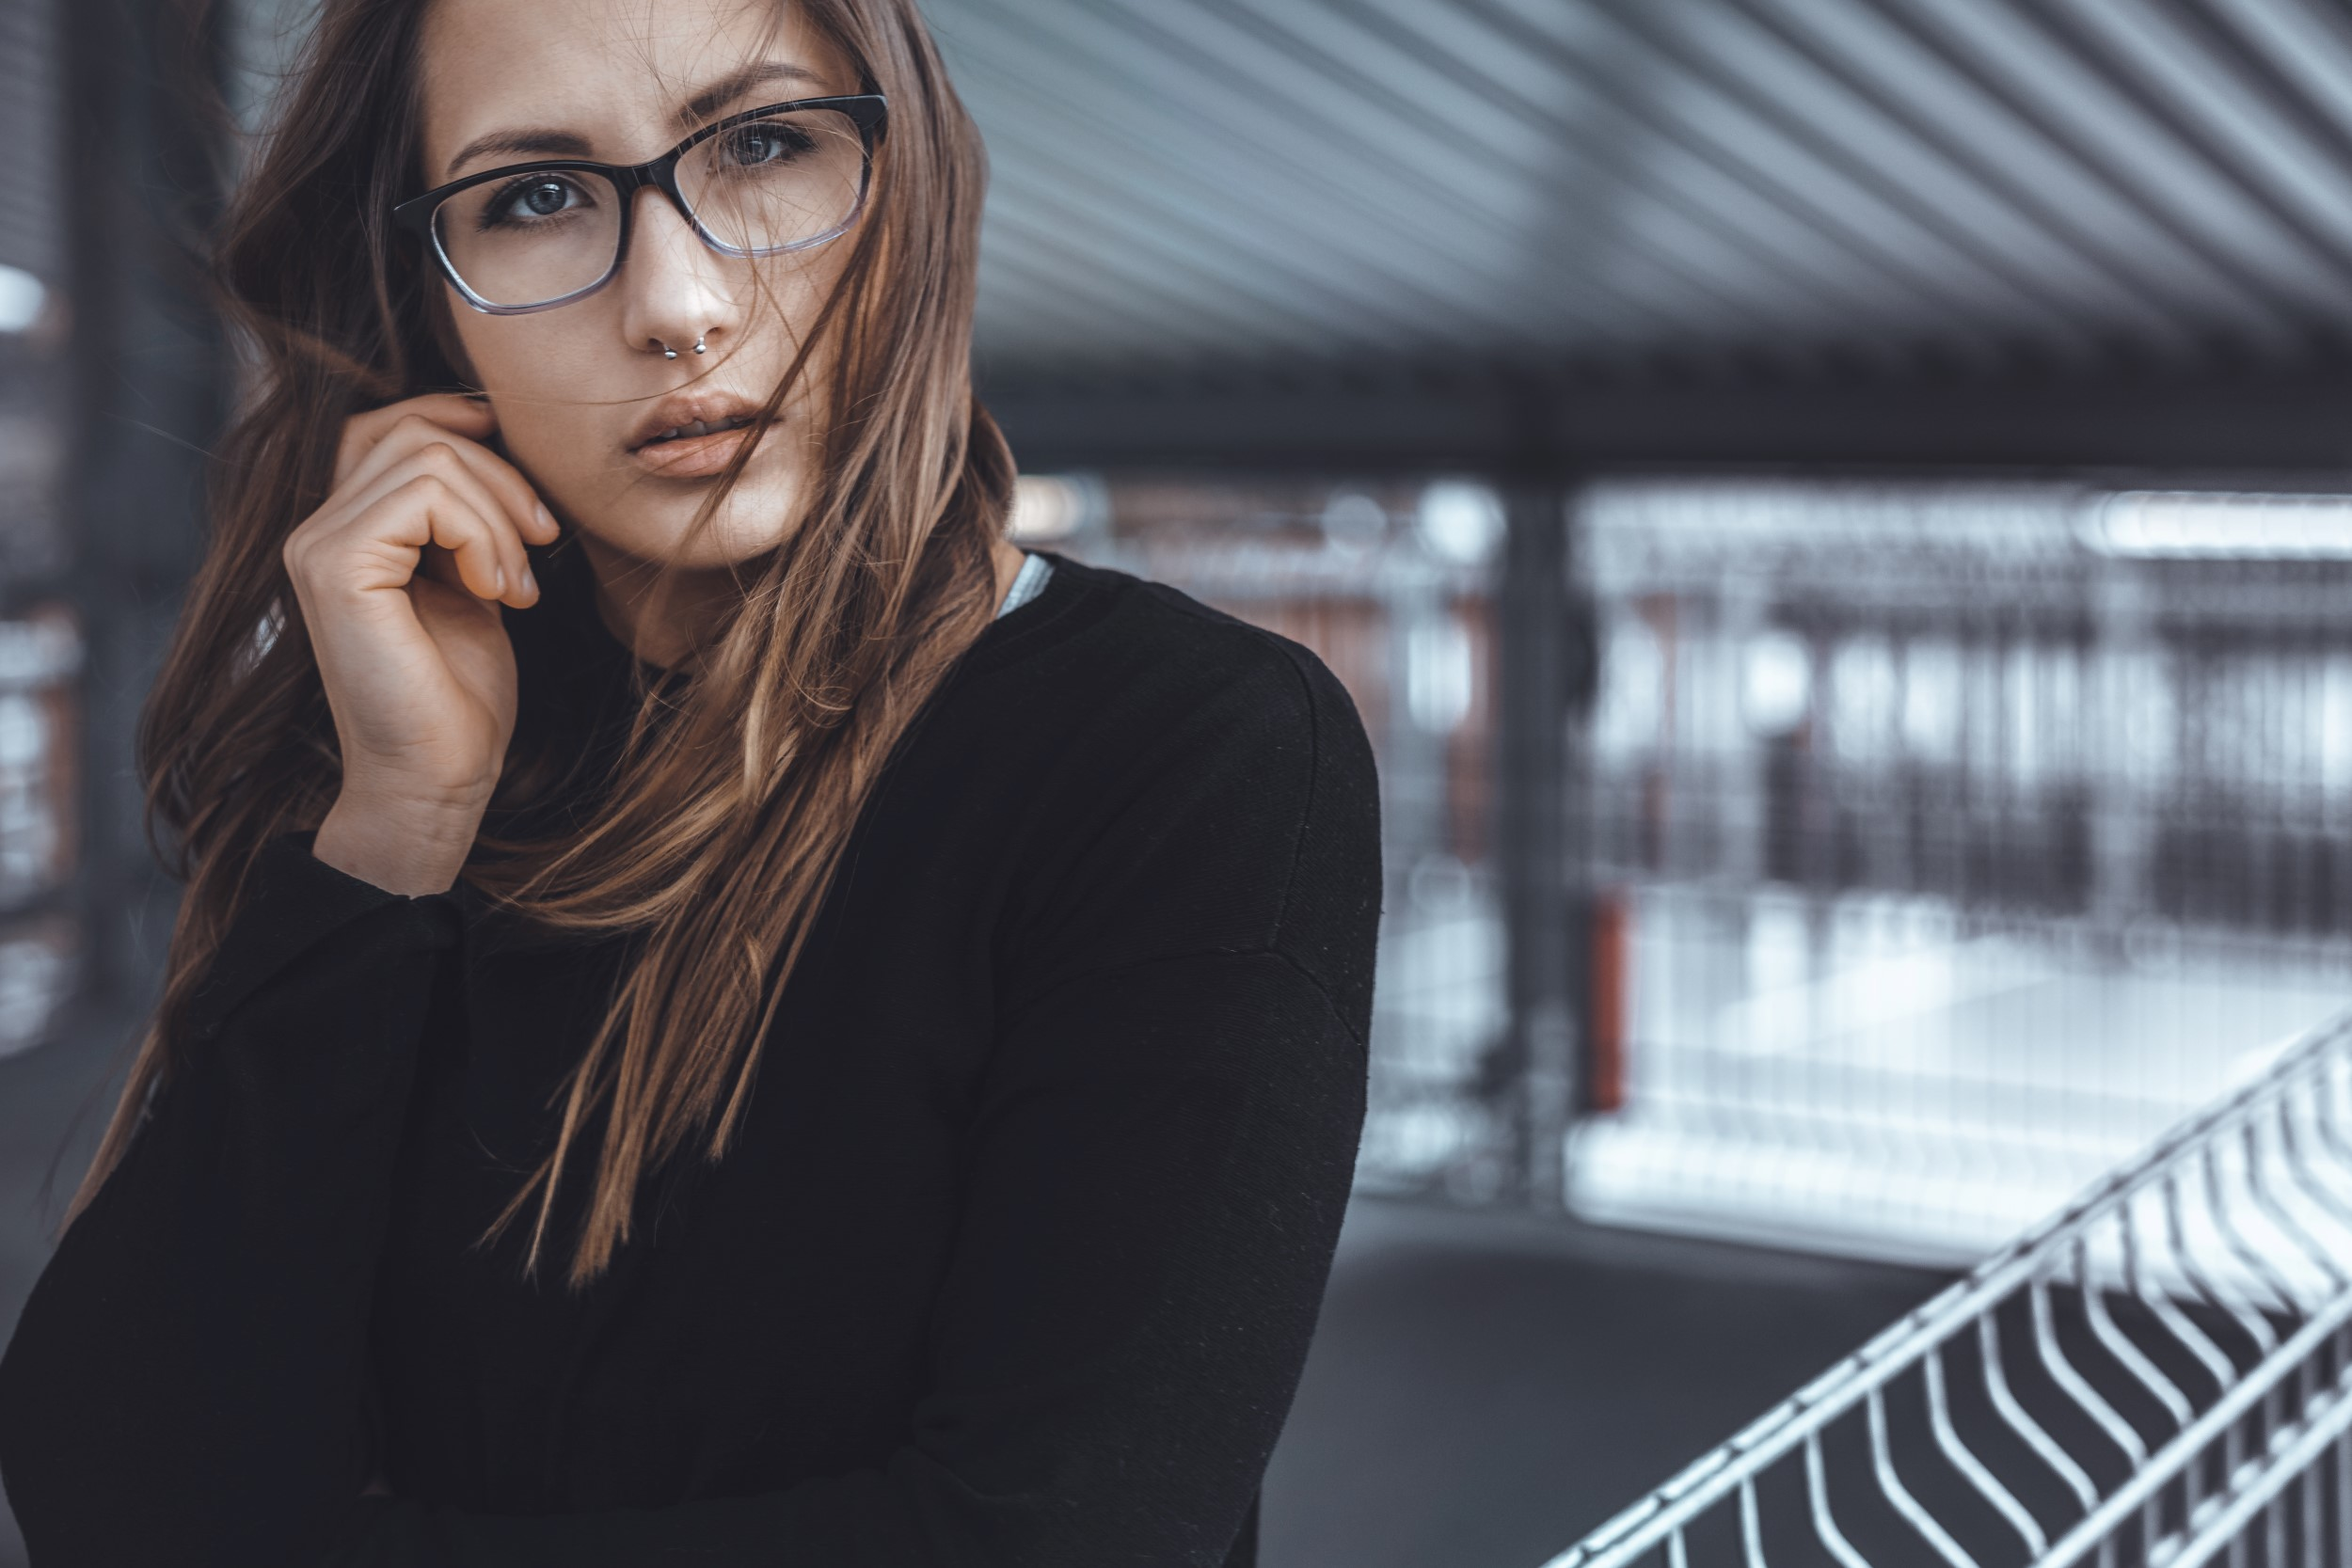 Model 2018 werbung Partnerschaftsvertrag: Parship